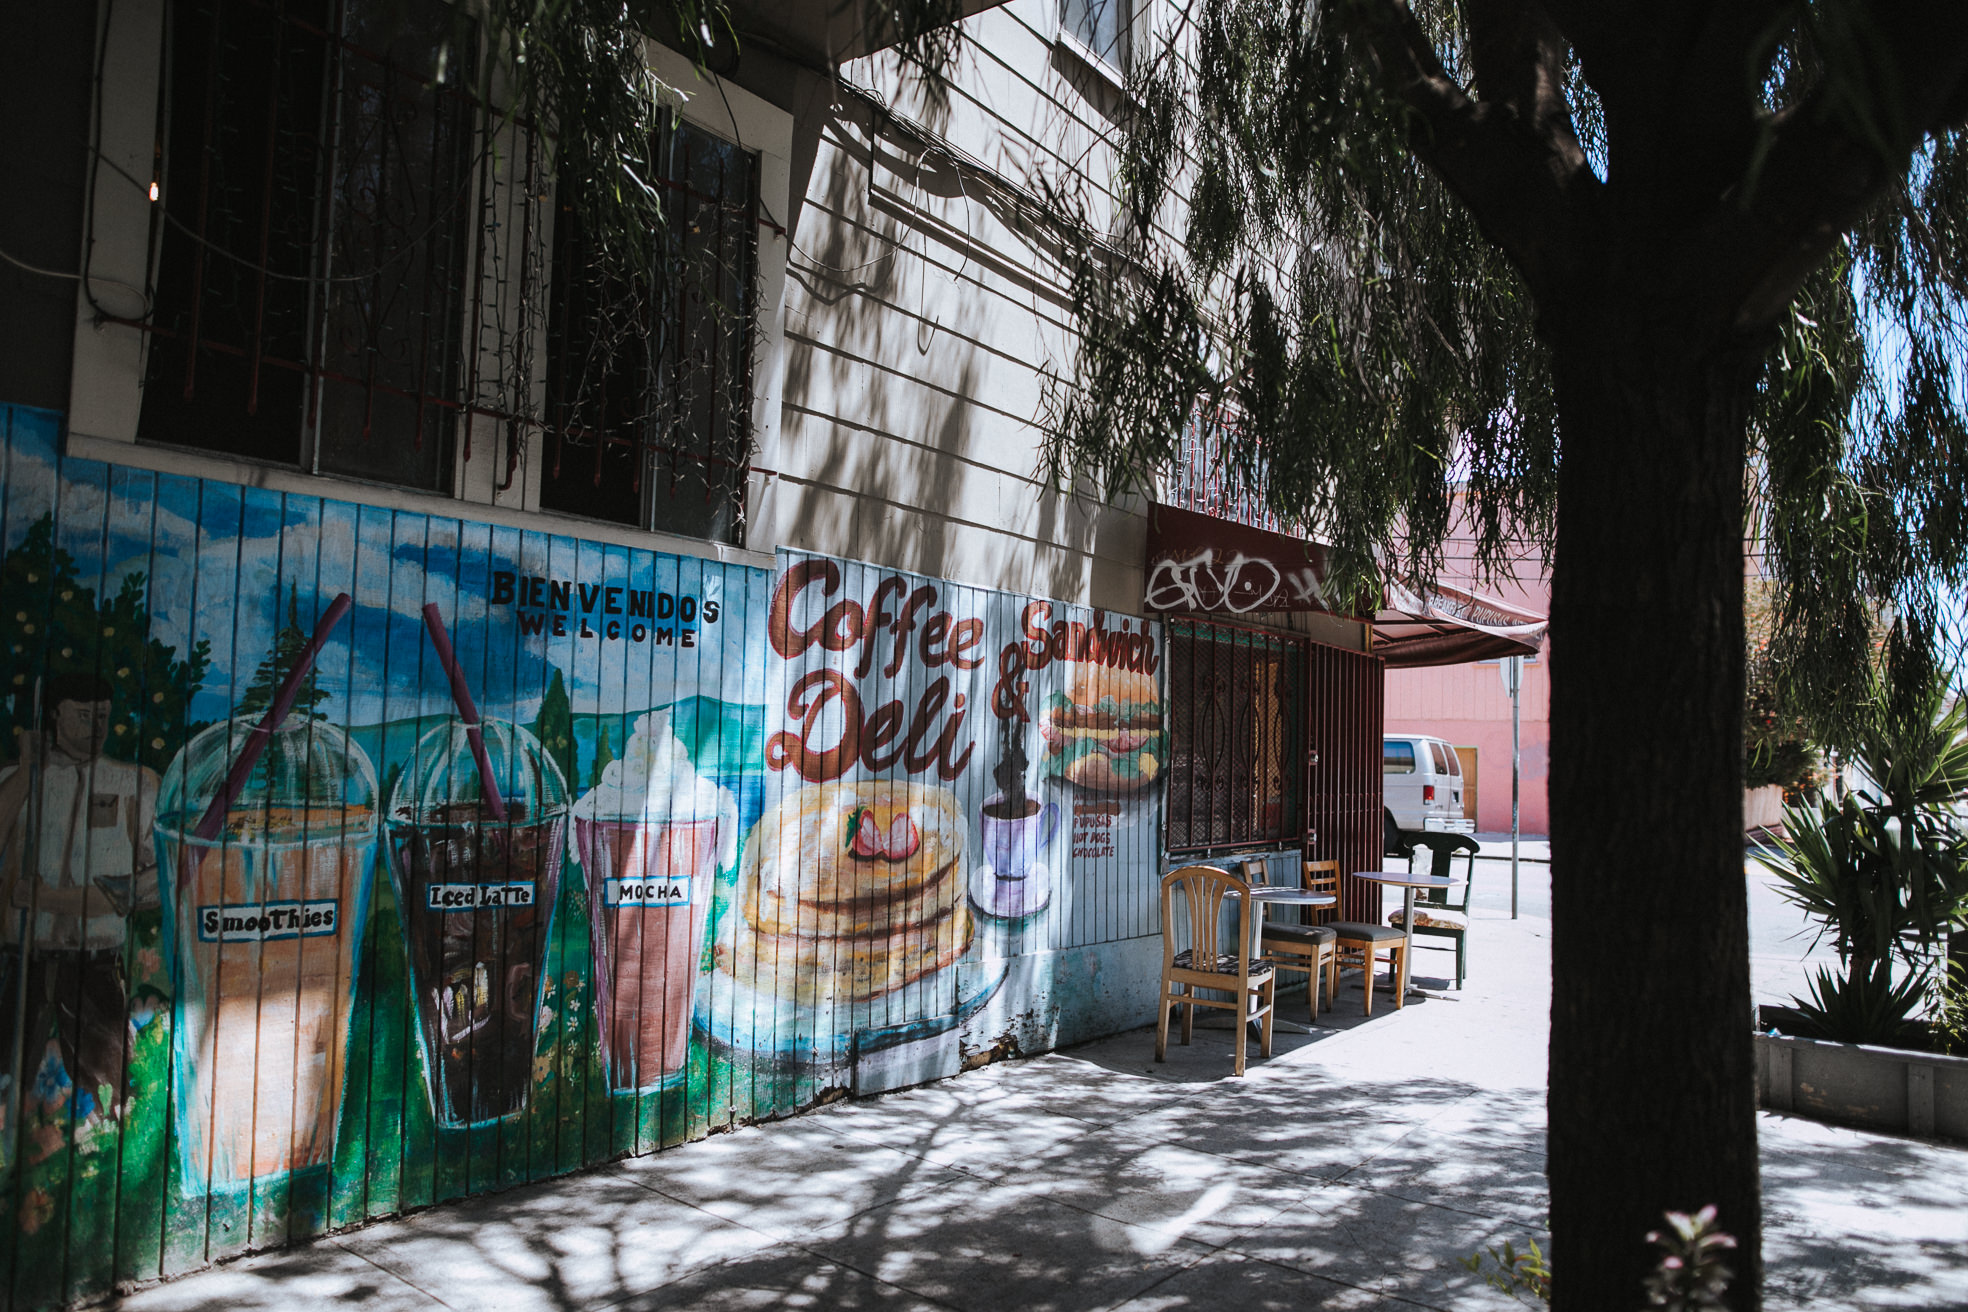 San-Francisco-BildervomLeben-4985